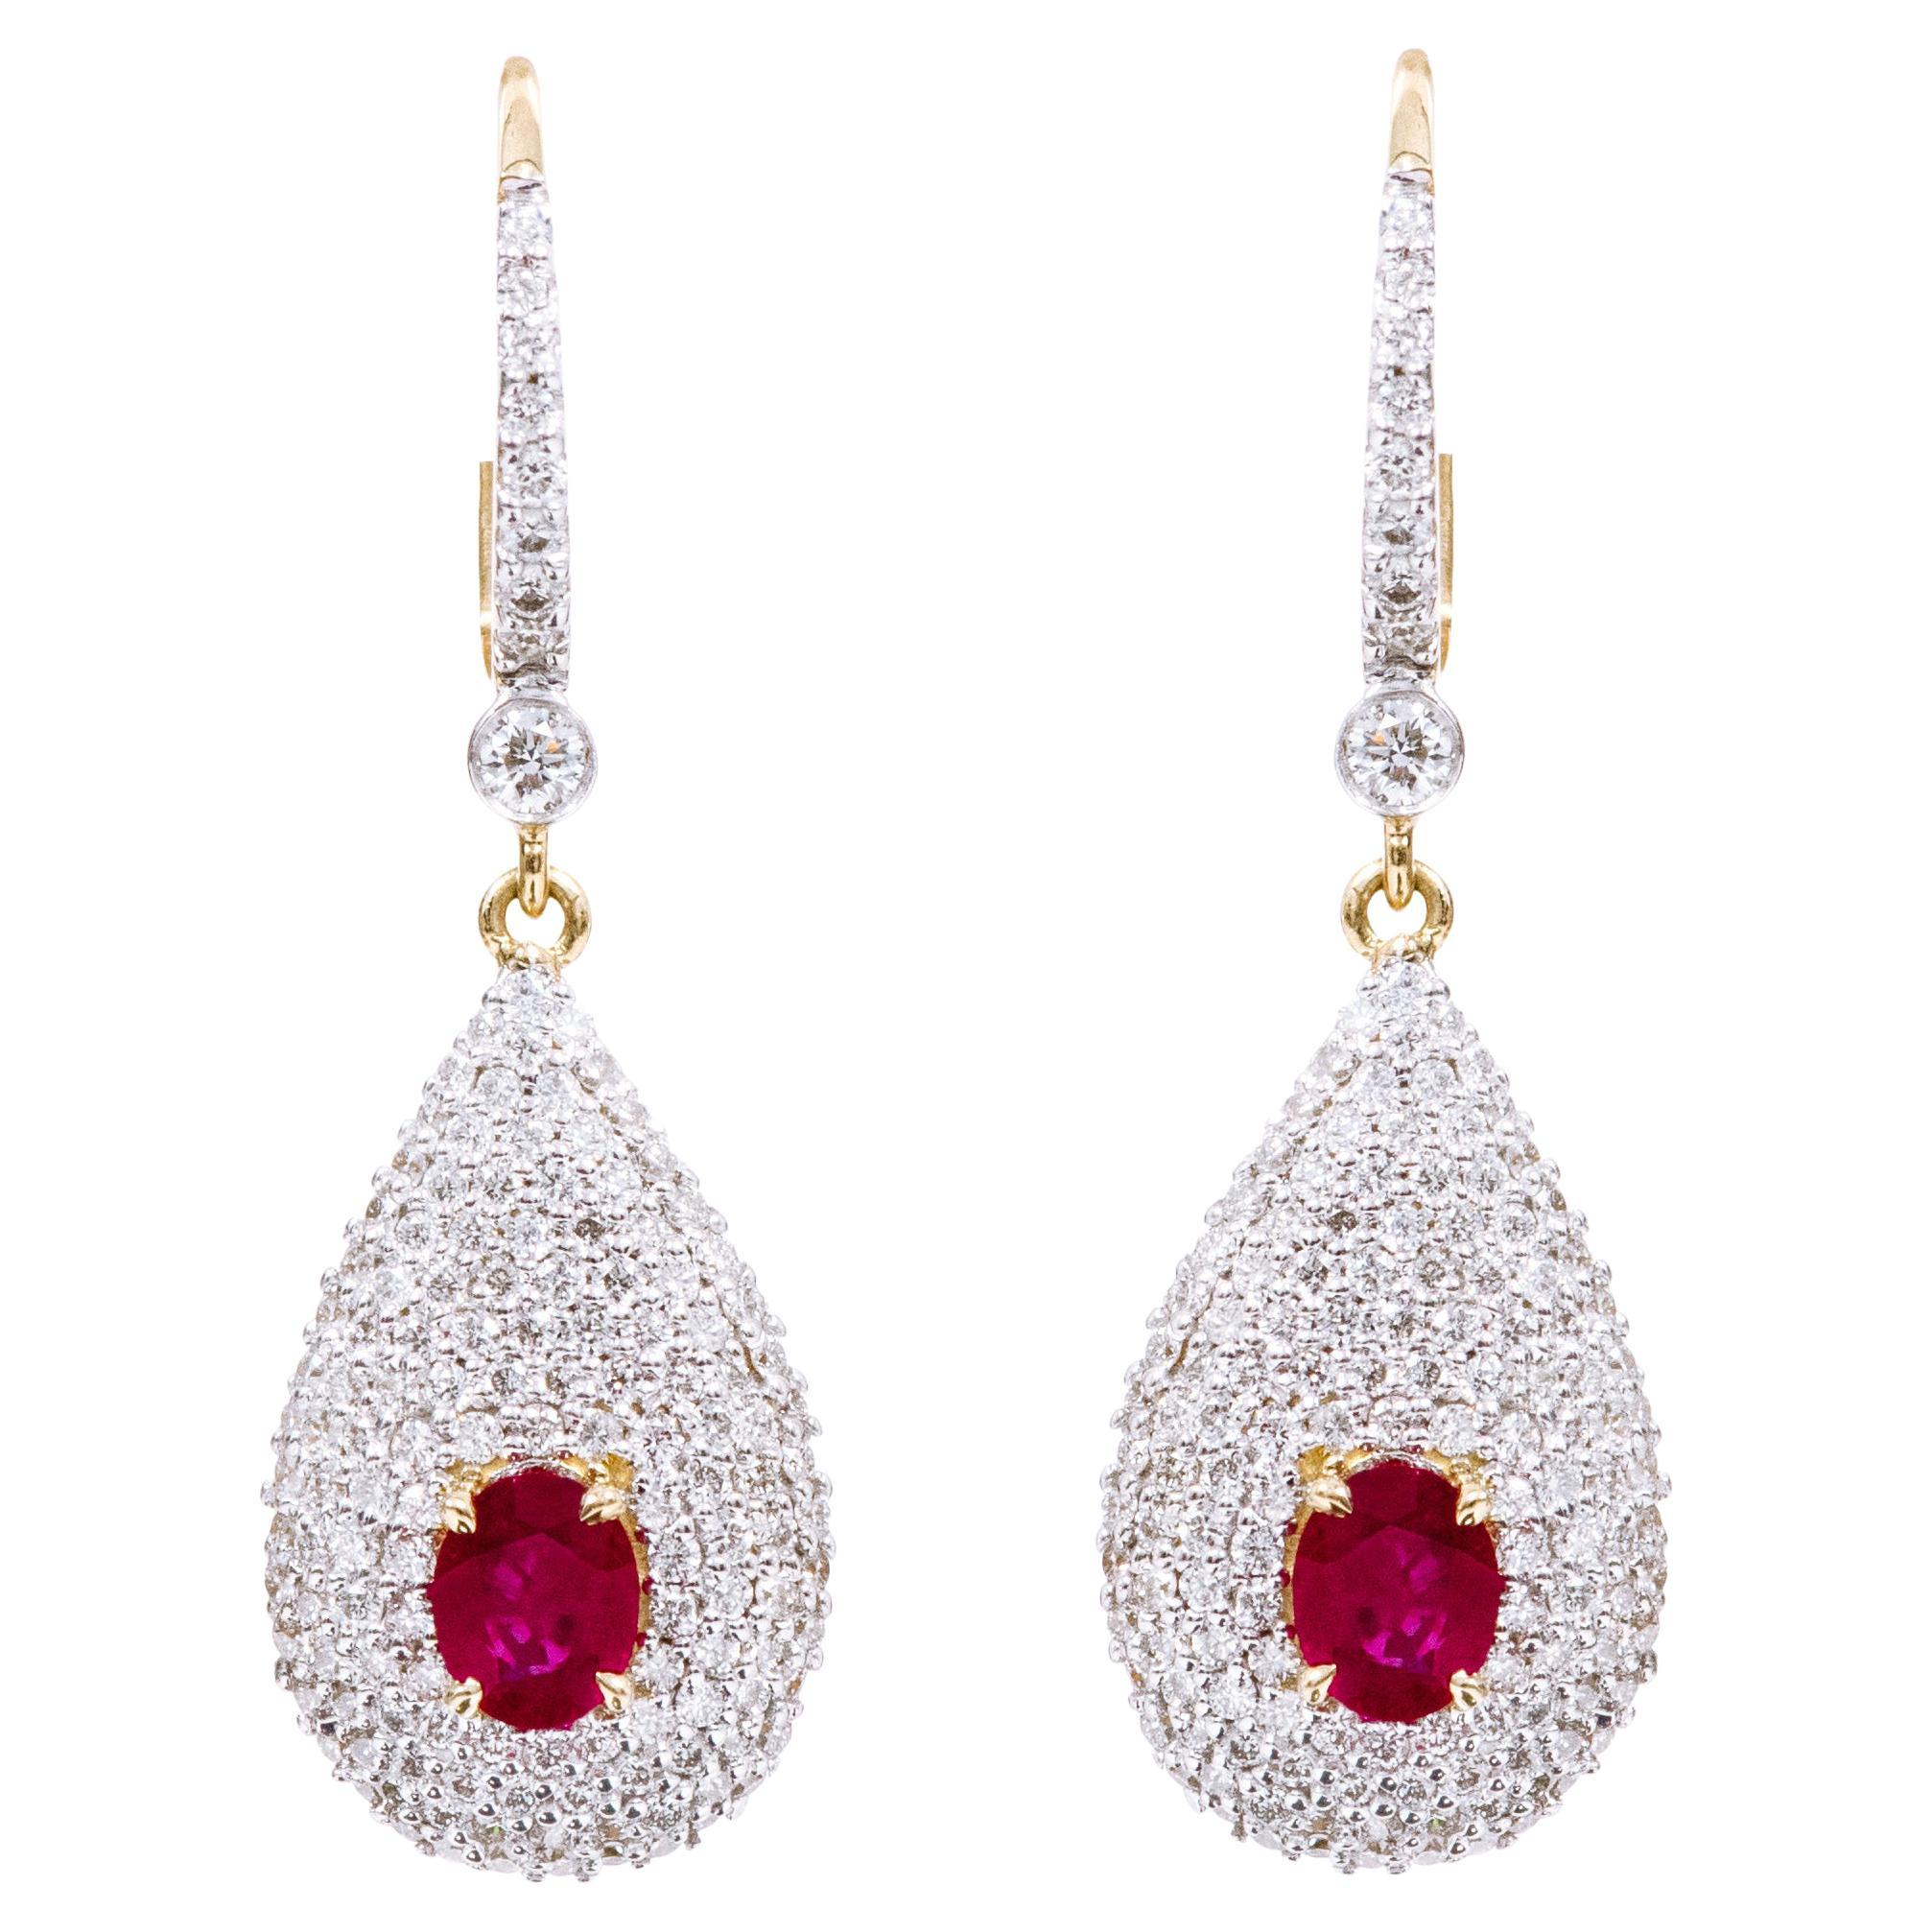 18 Karat Yellow Gold Diamond and Ruby Drop Earrings